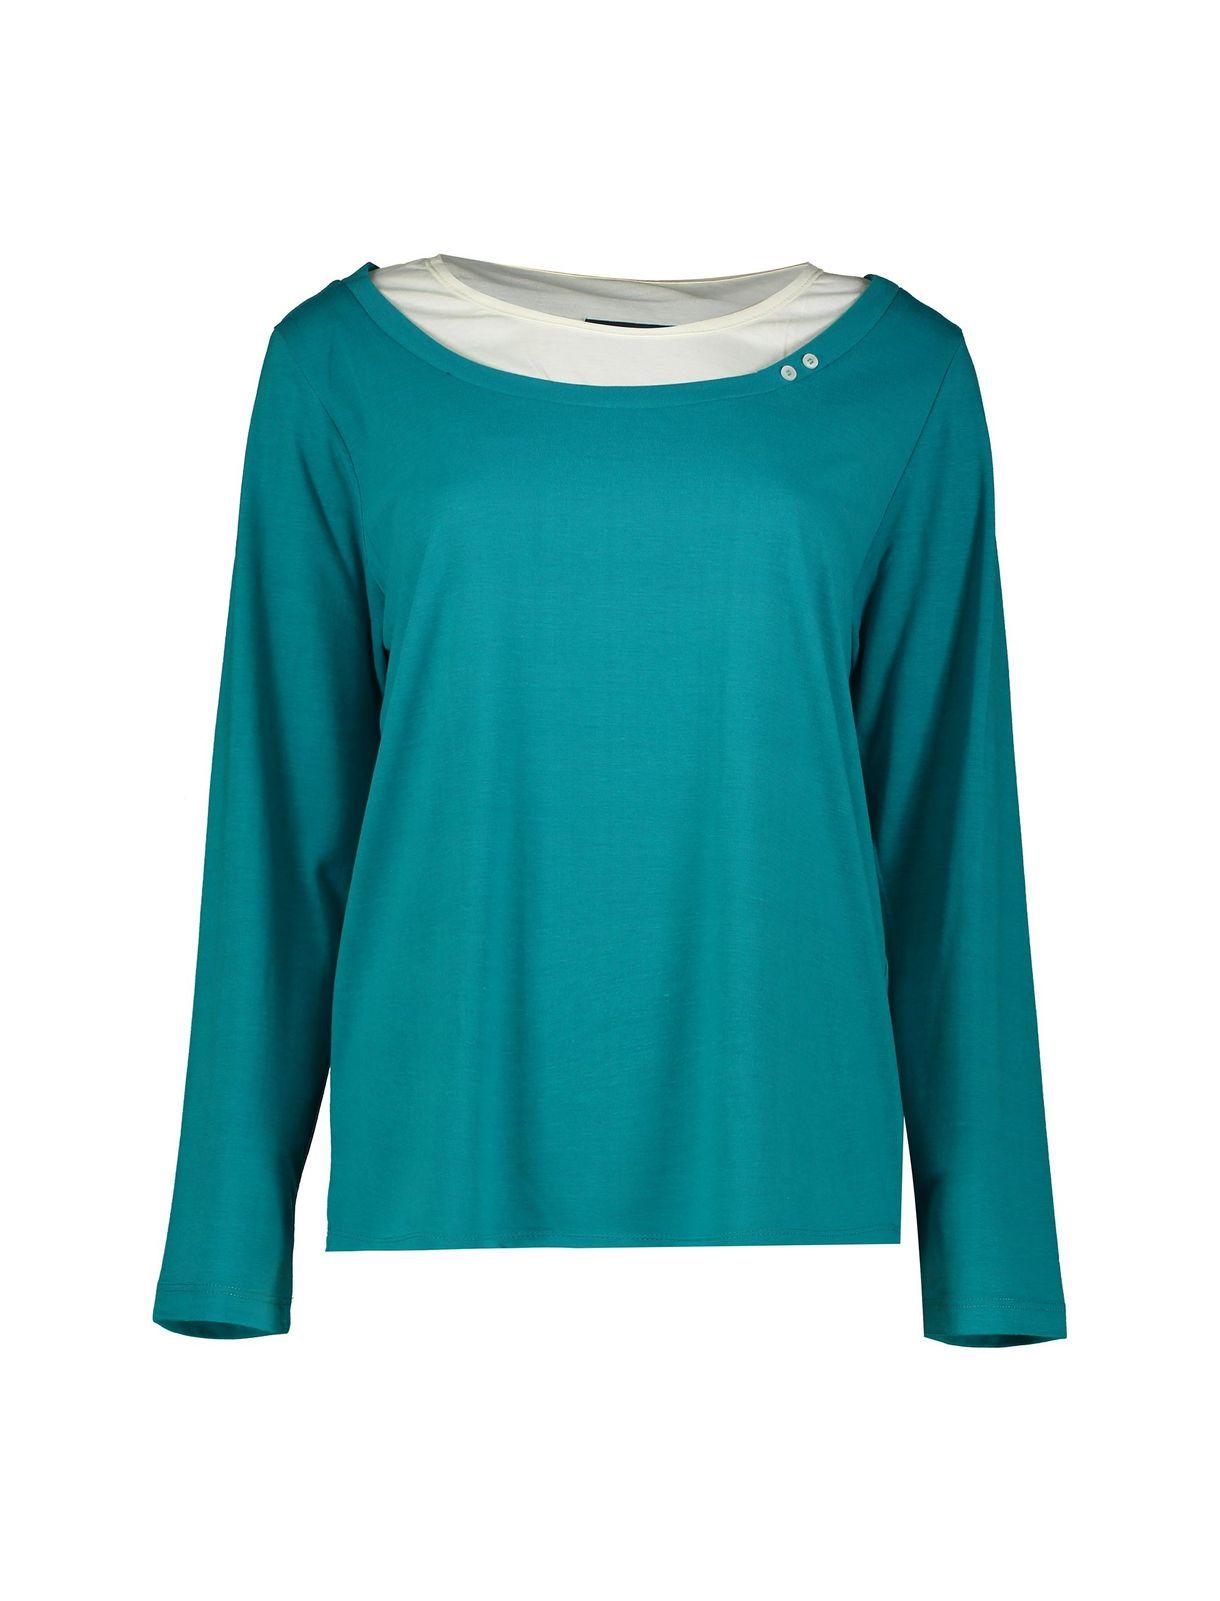 تی شرت آستین بلند زنانه – رامکات  Women Long Sleeve T-Shirt – Ramcott